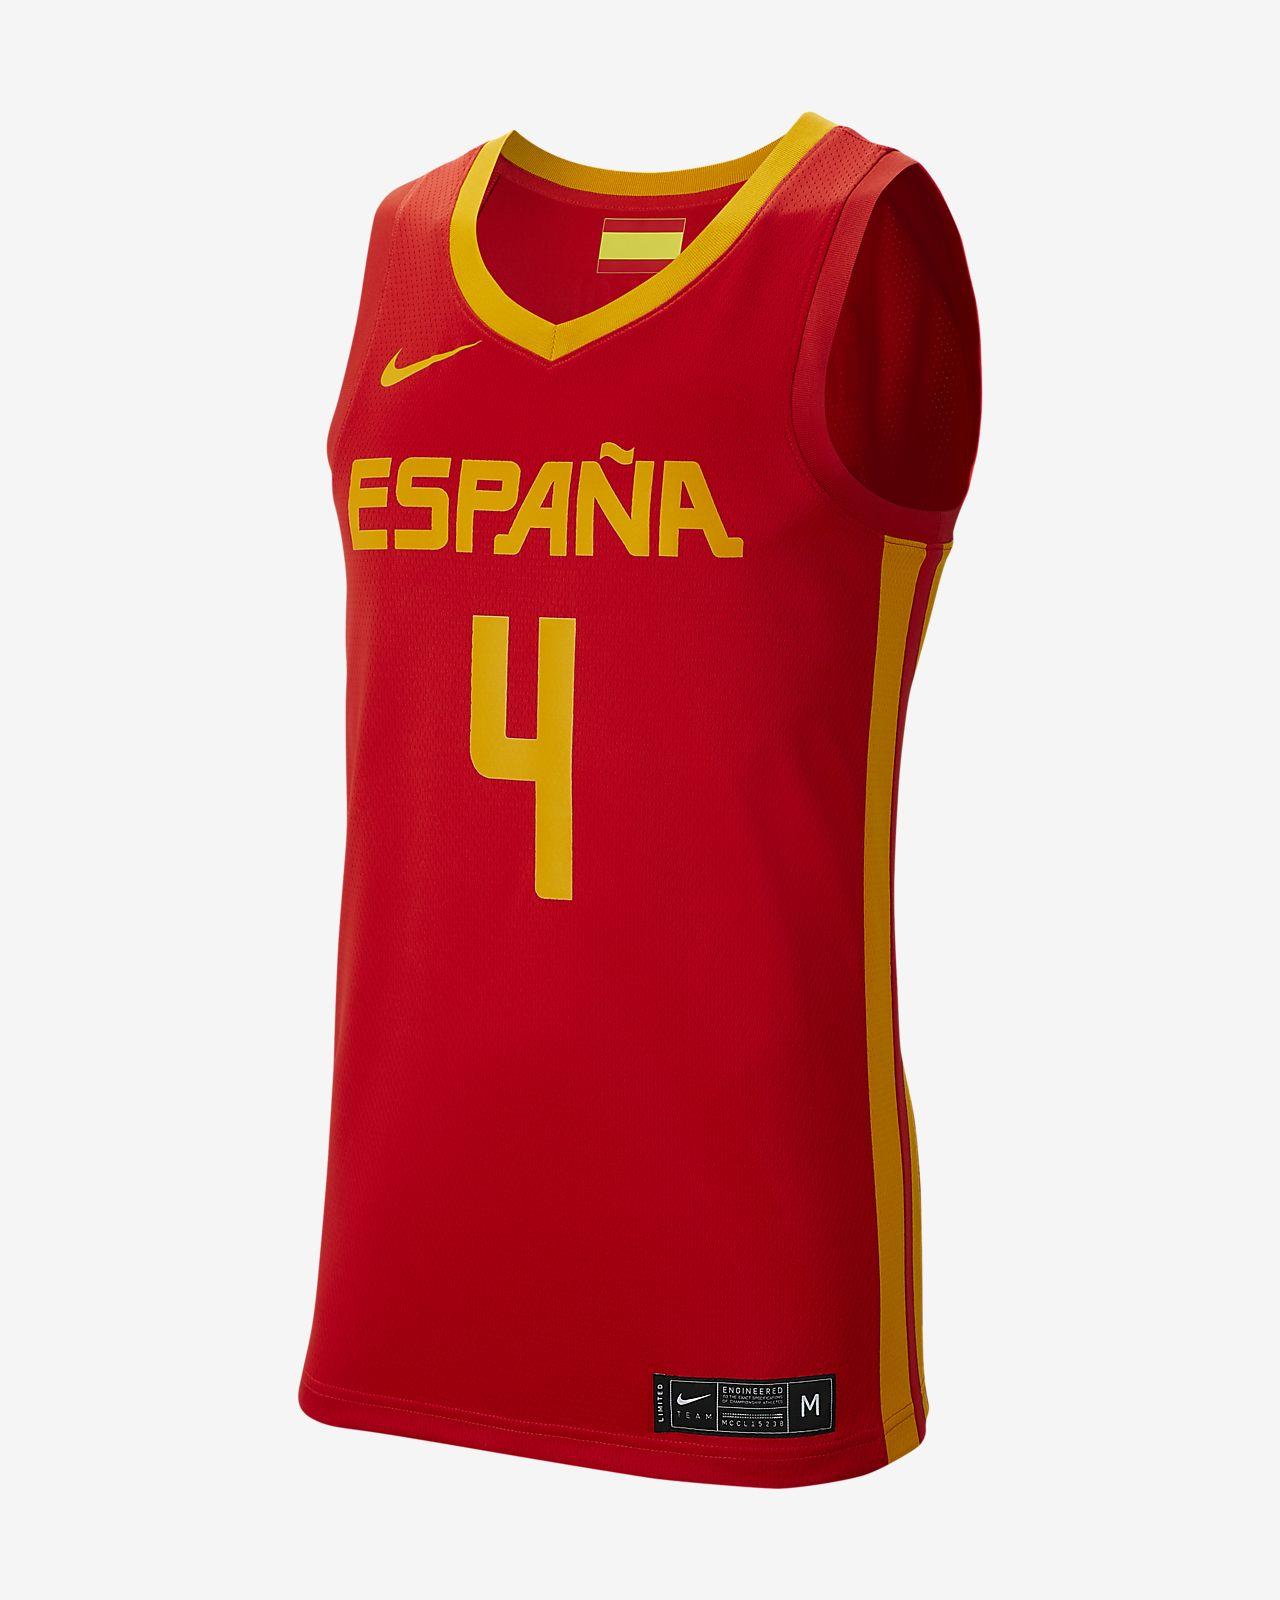 Camisola de basquetebol Spain Nike (Road) para homem